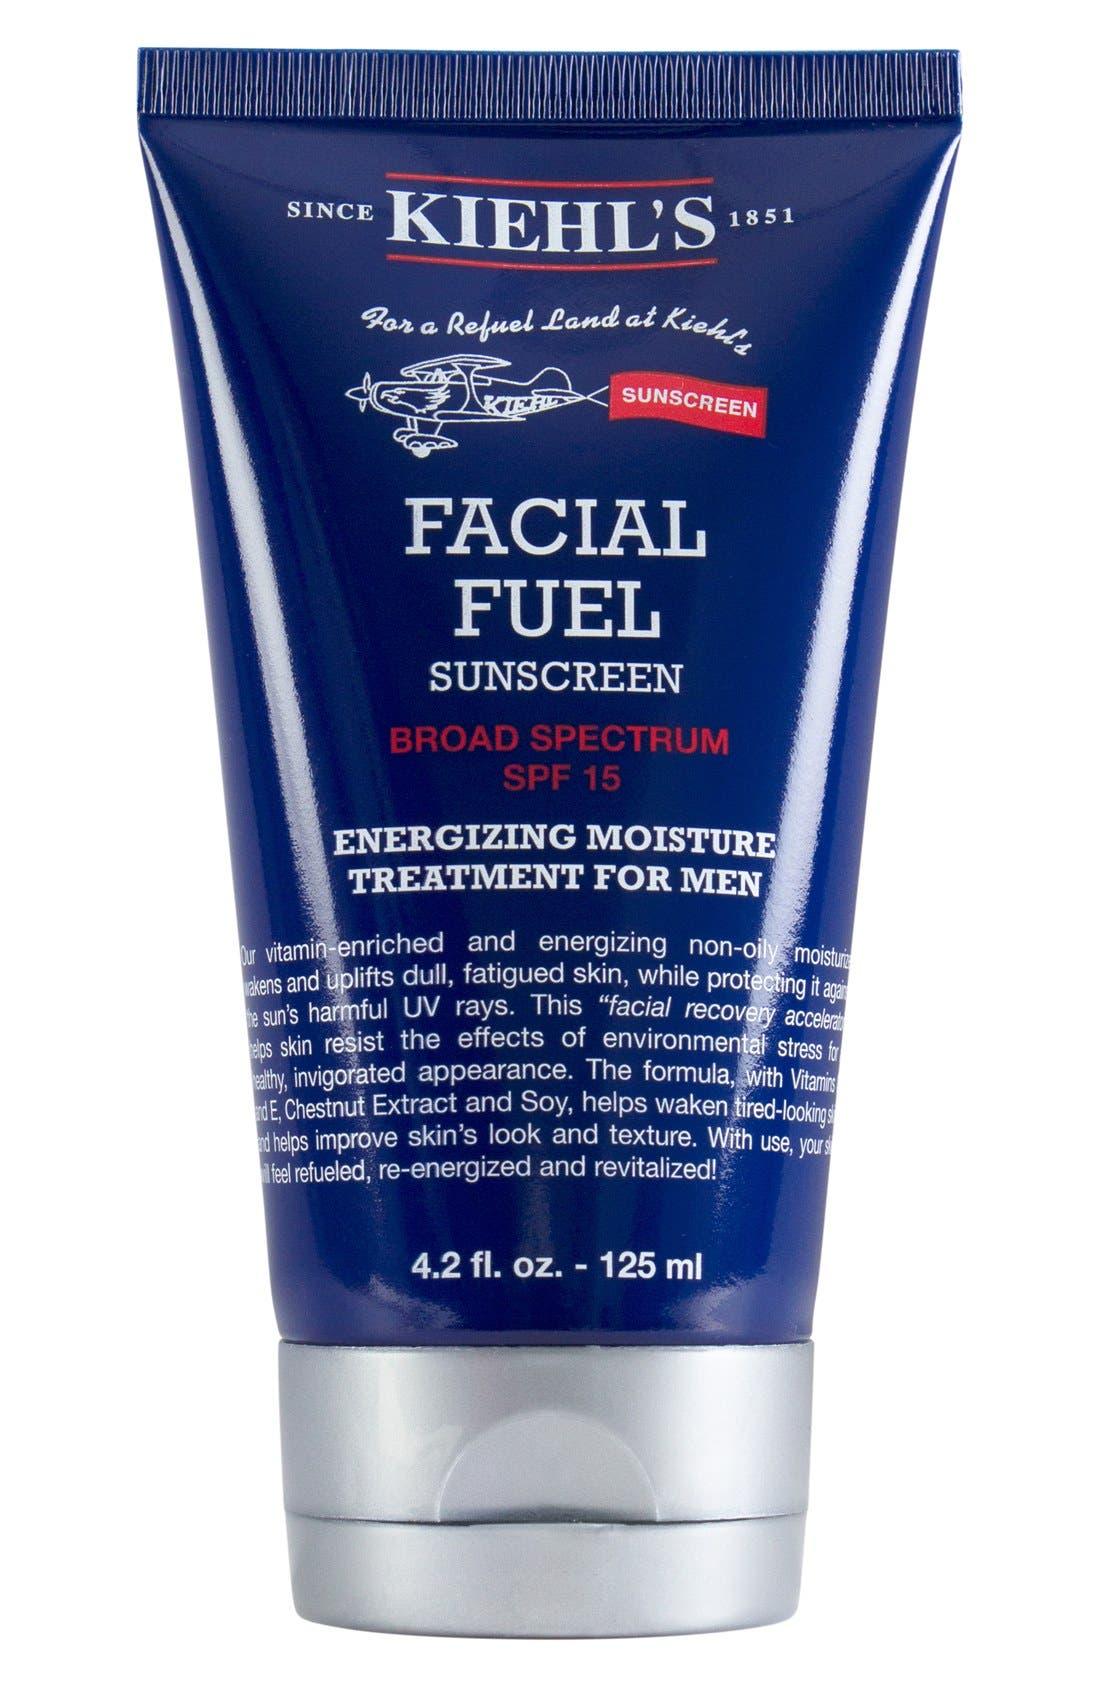 'Facial Fuel' EnergizingMoisture Treatment for Men SPF 15,                         Main,                         color, 000